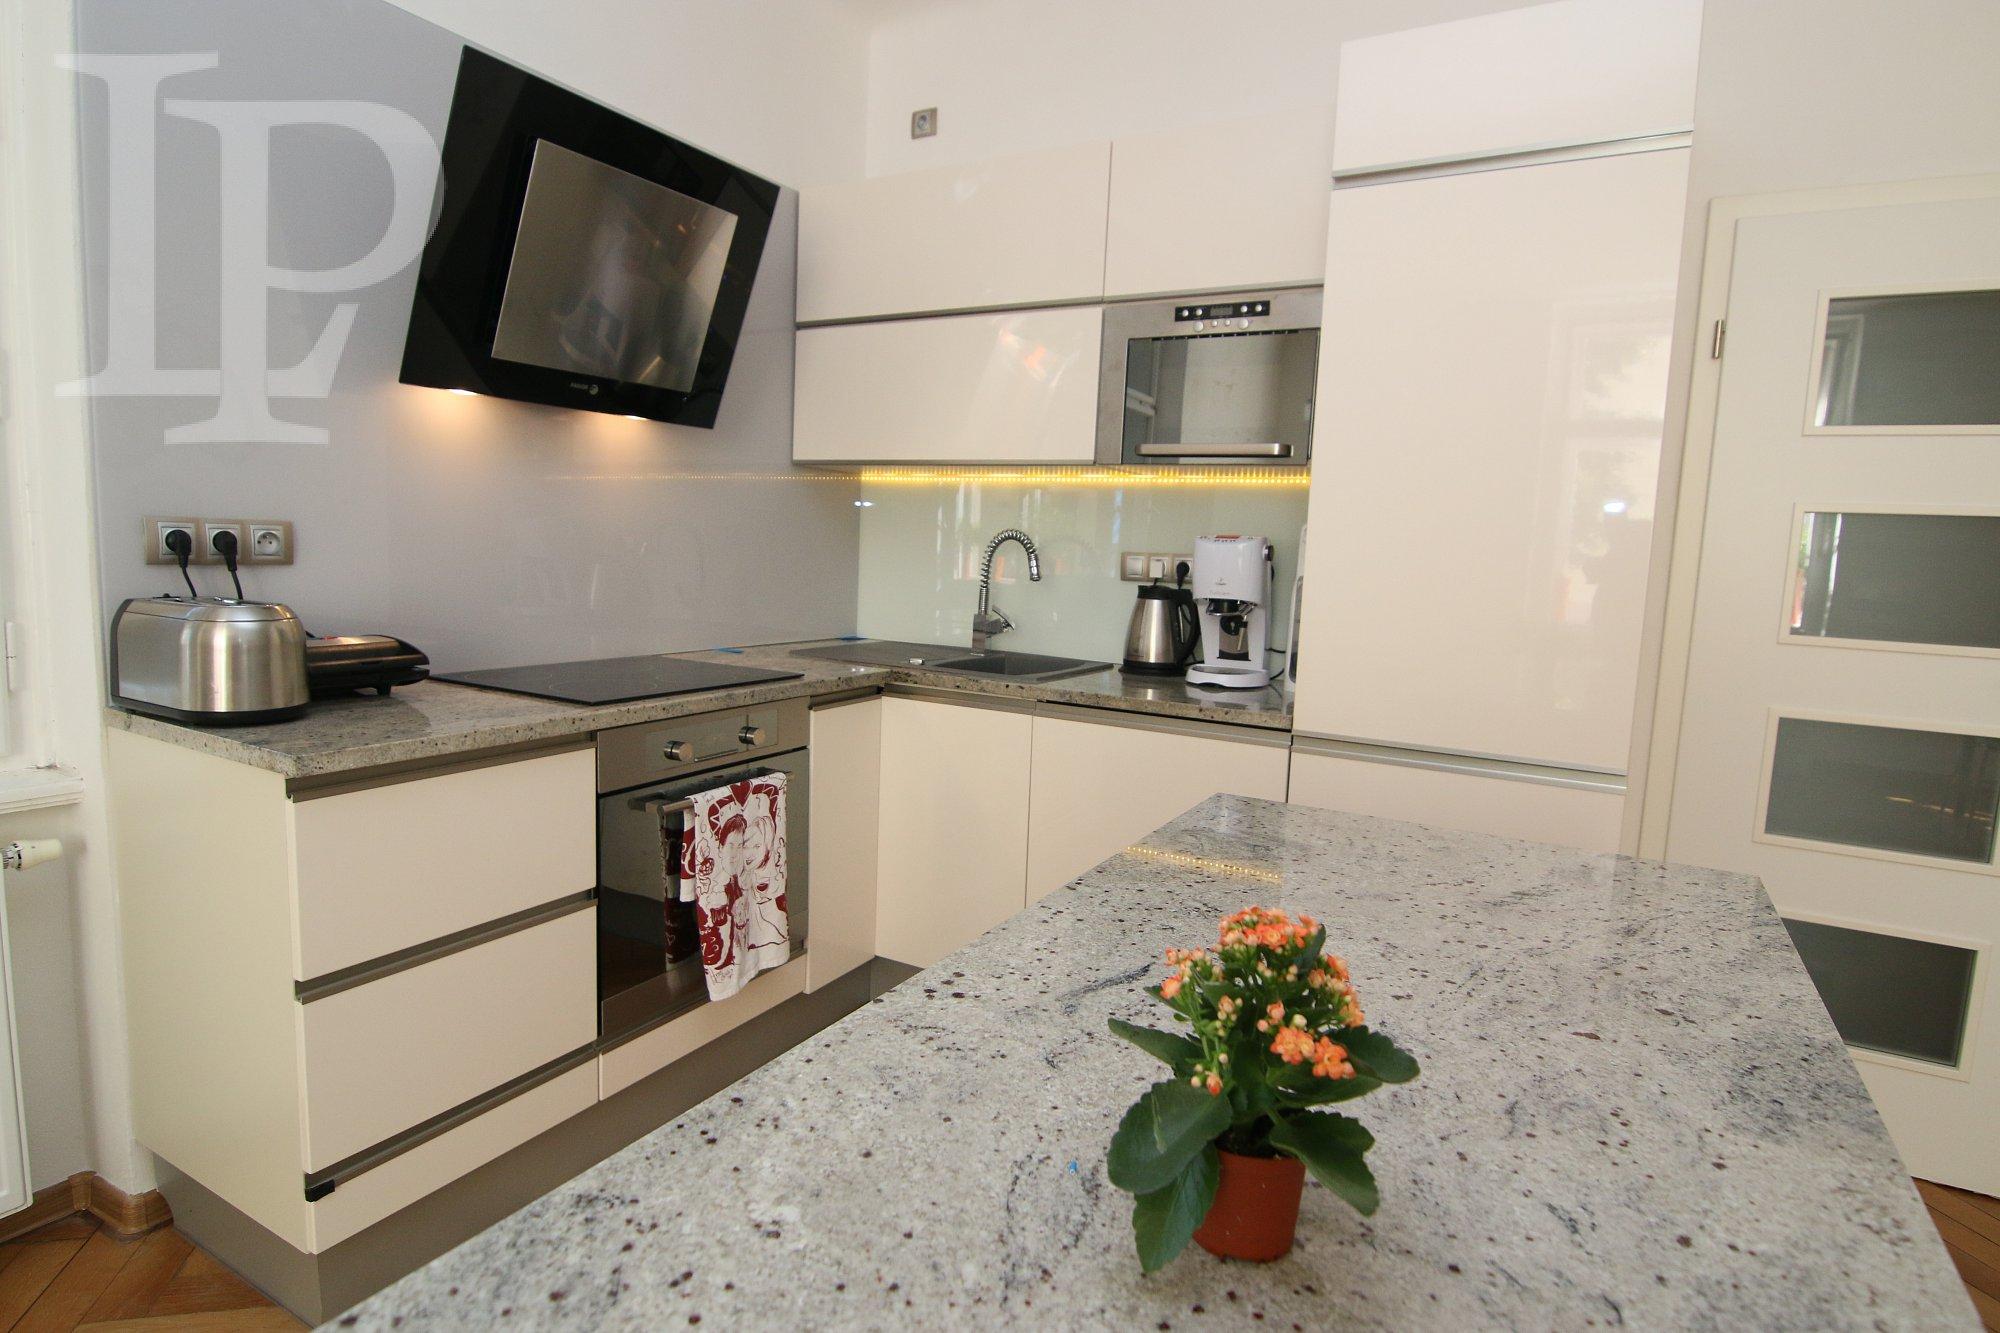 Luxusní byt, Praha 6 Bubeneč, 4+kk , 121 m2, v OV, cihla